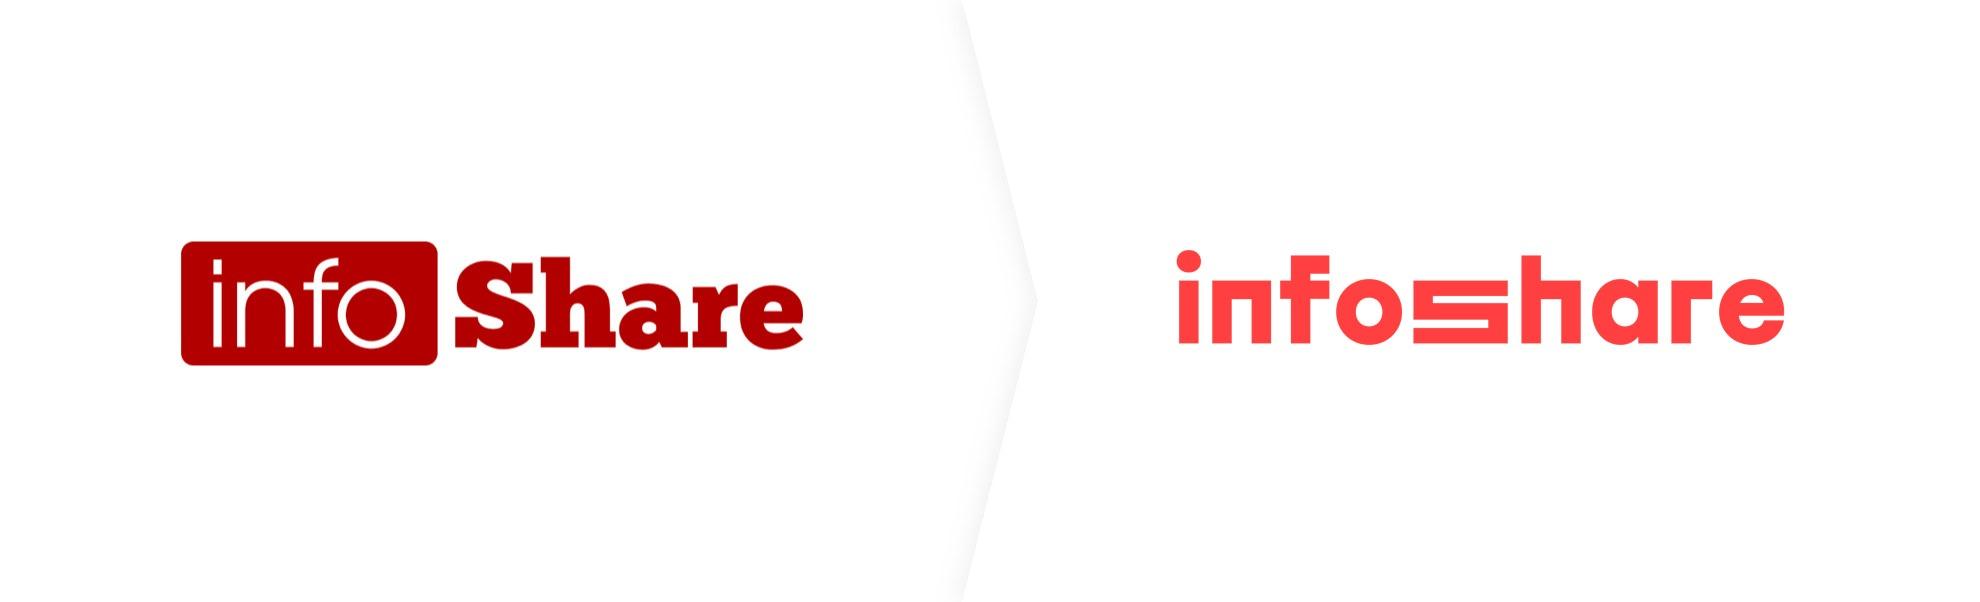 Stare i nowe logo InfoShare